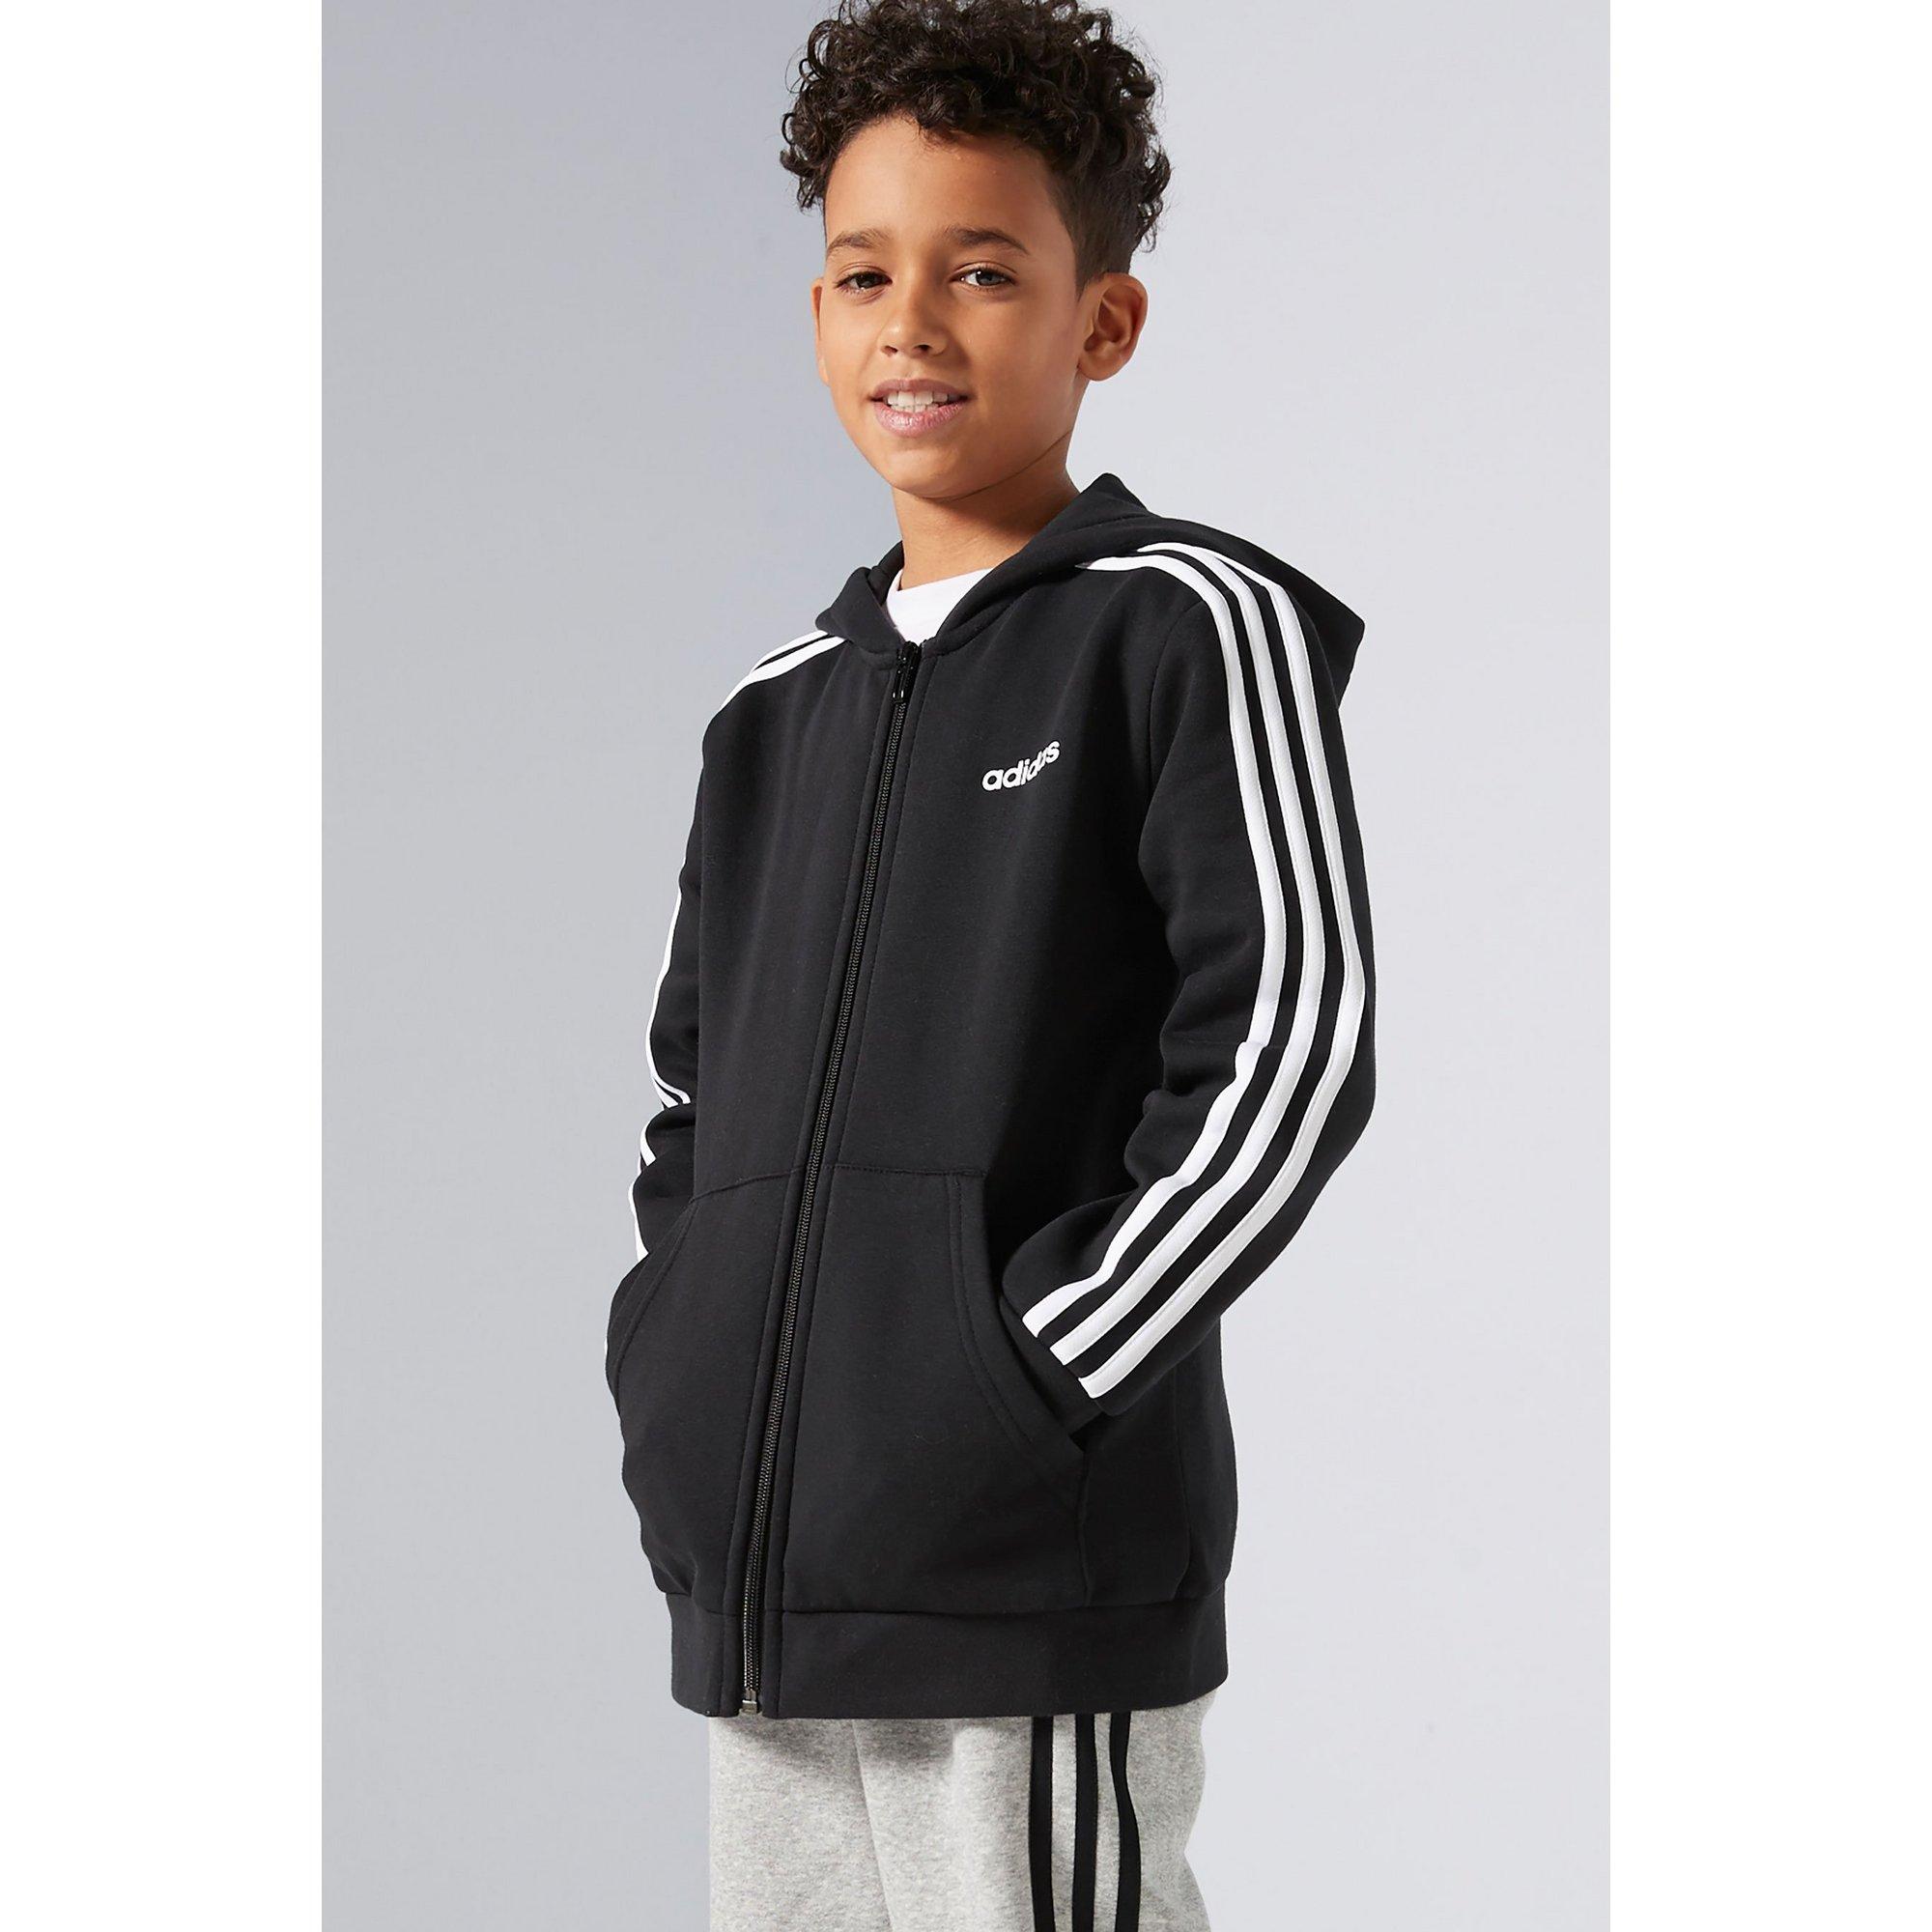 Image of Boys adidas Essentials 3-Stripes Black Zip Through Hoody